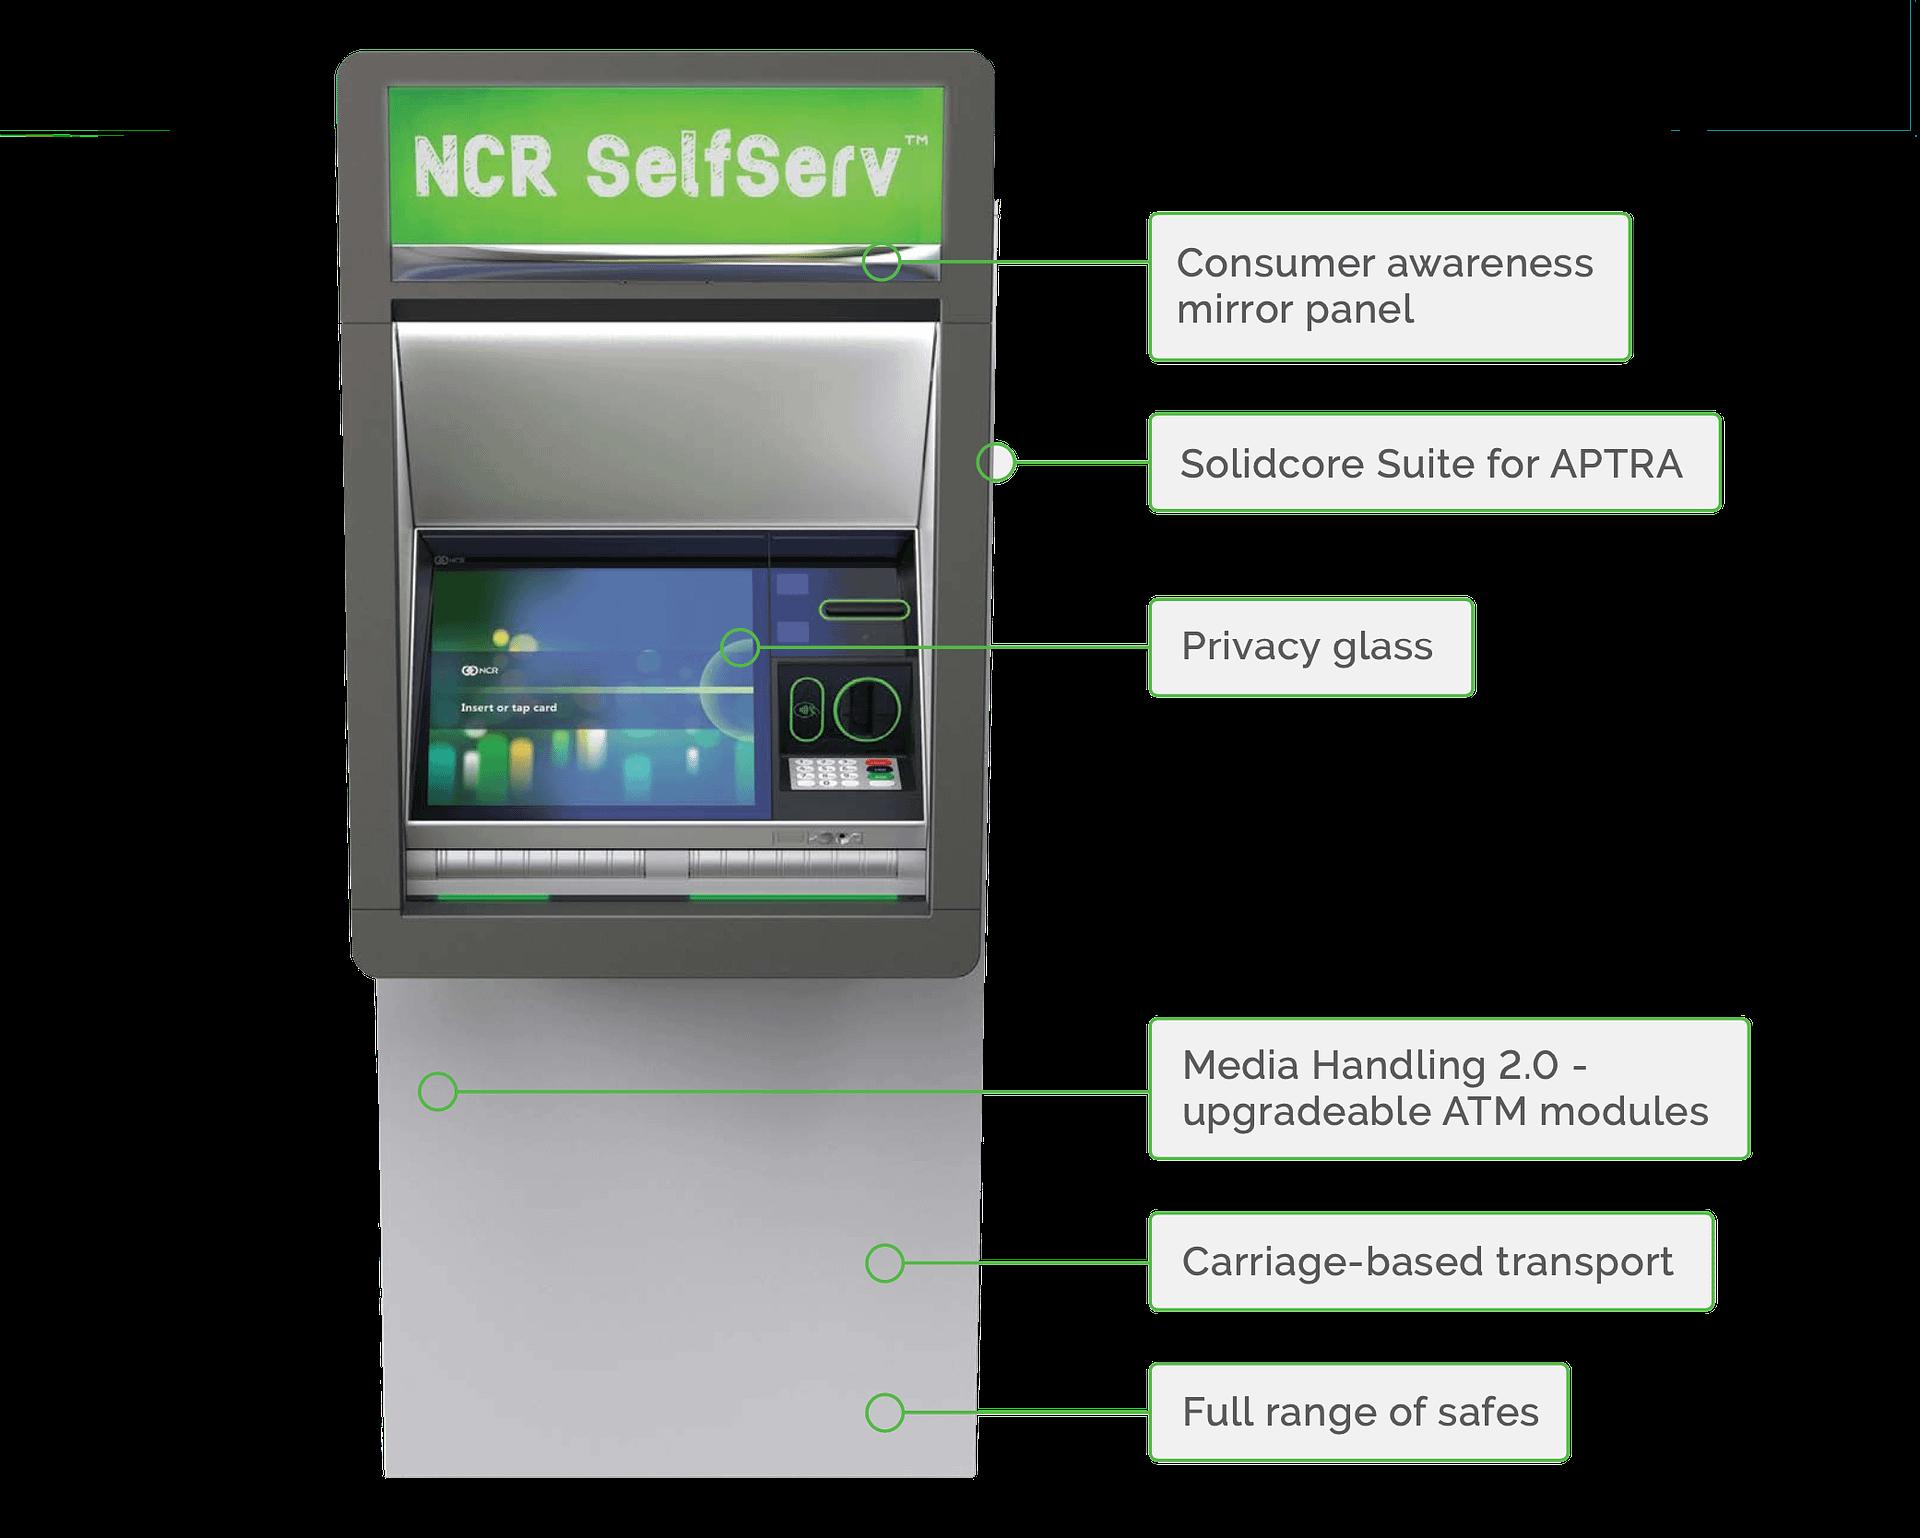 ncr-self-serv-protect copy